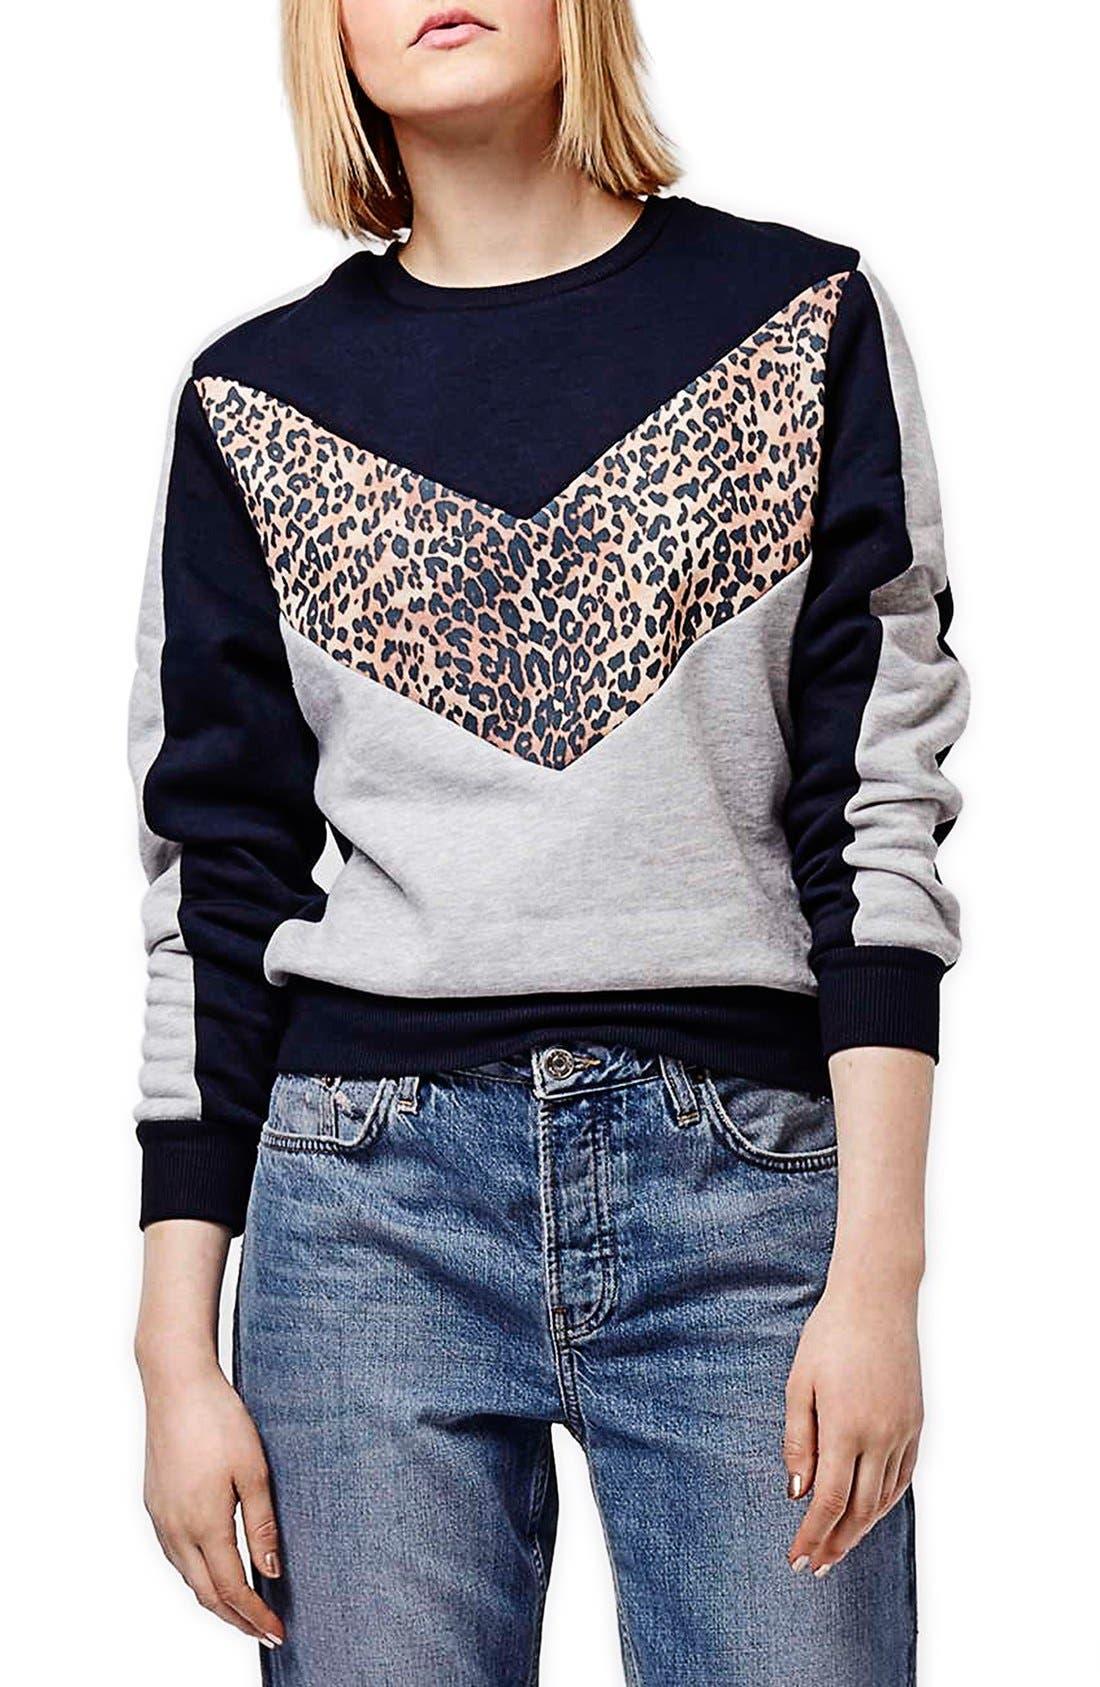 Alternate Image 1 Selected - Topshop Leopard Print Colorblock Sweatshirt (Regular & Petite)